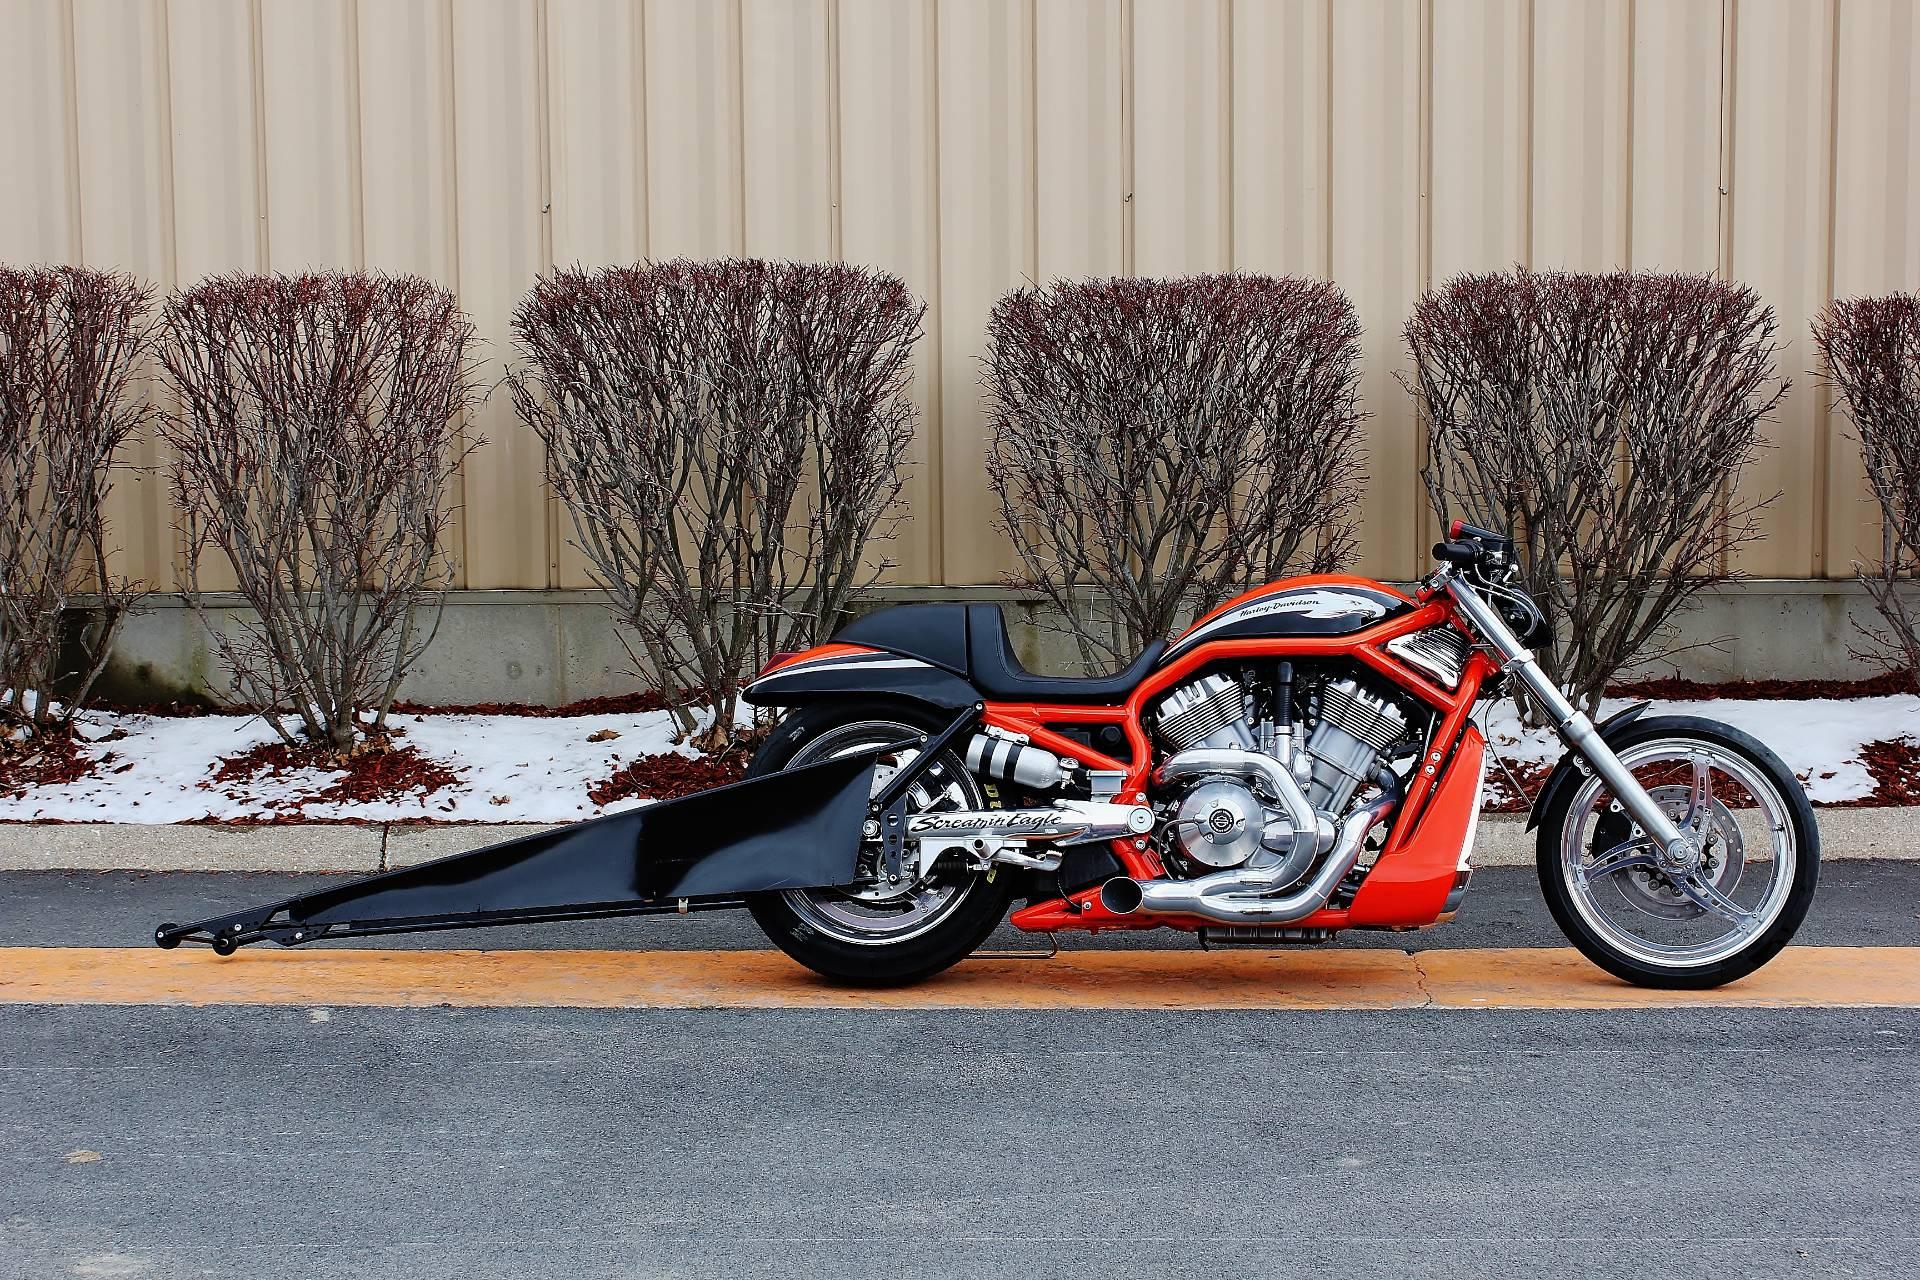 2006 Harley-Davidson Destroyer in Pittsfield, Massachusetts